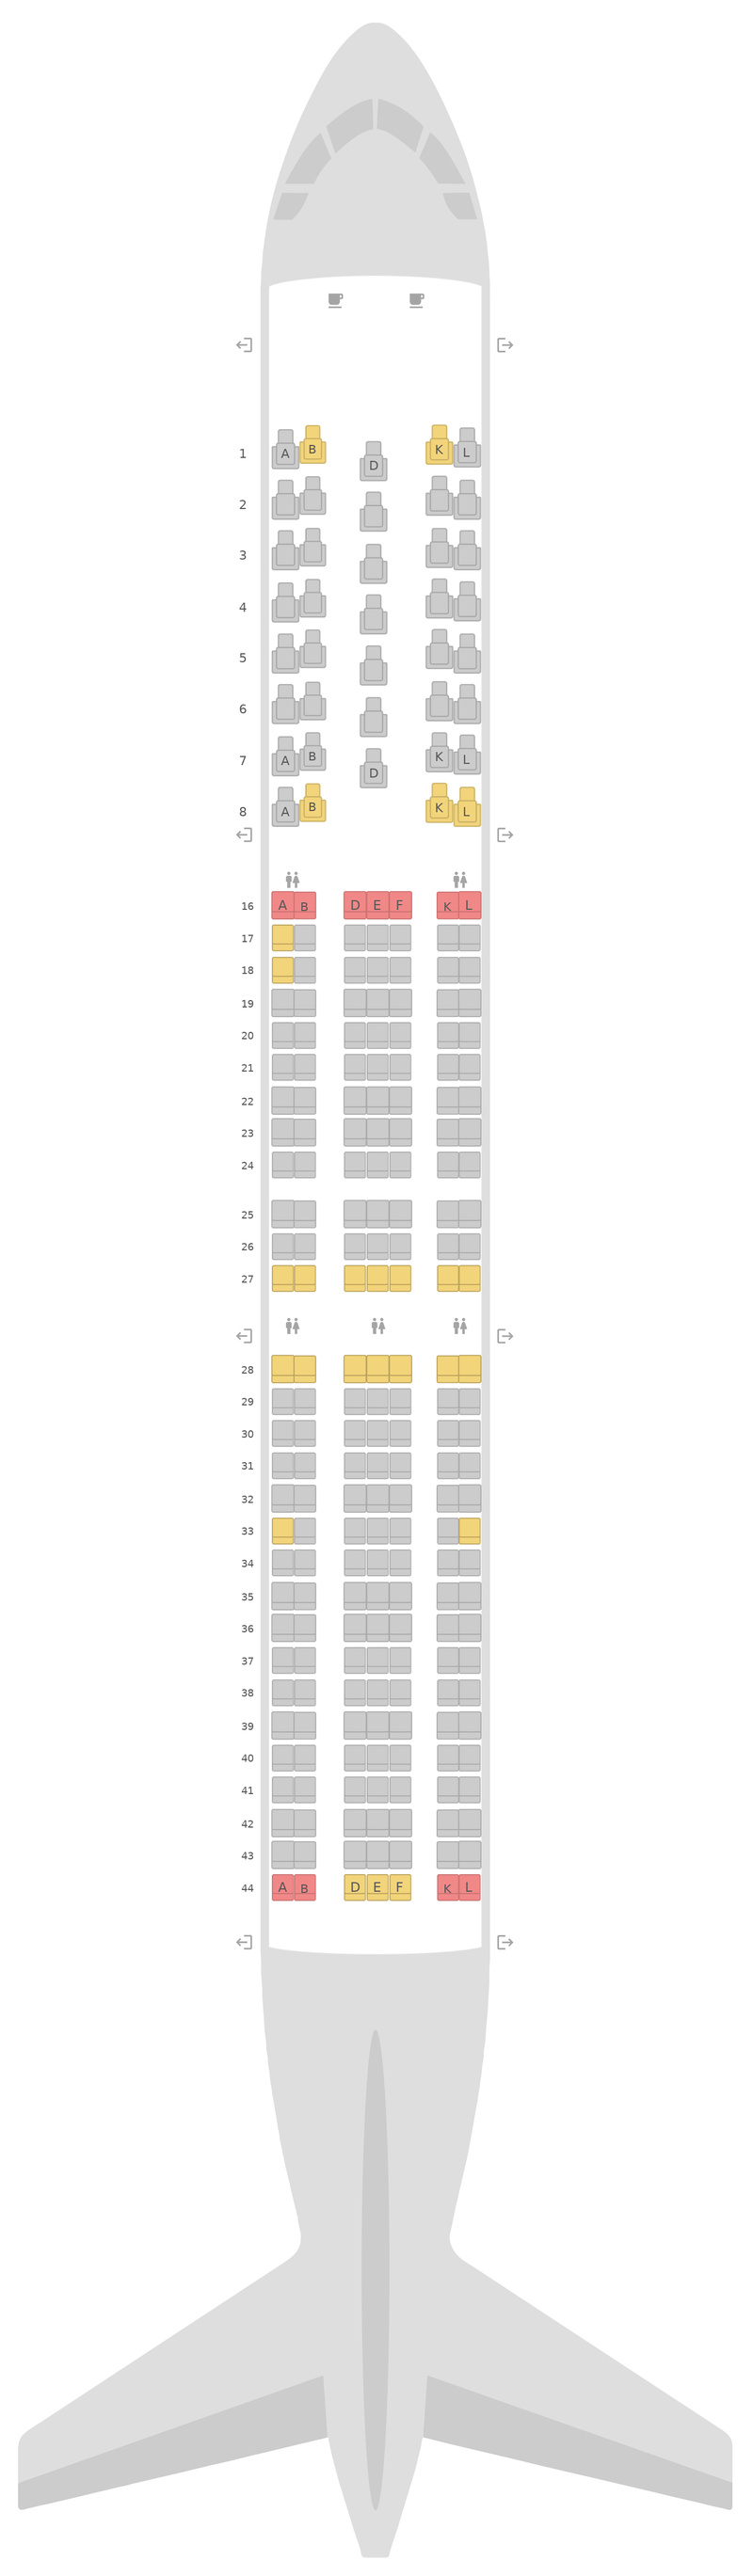 Seat Map United Boeing 767-400ER